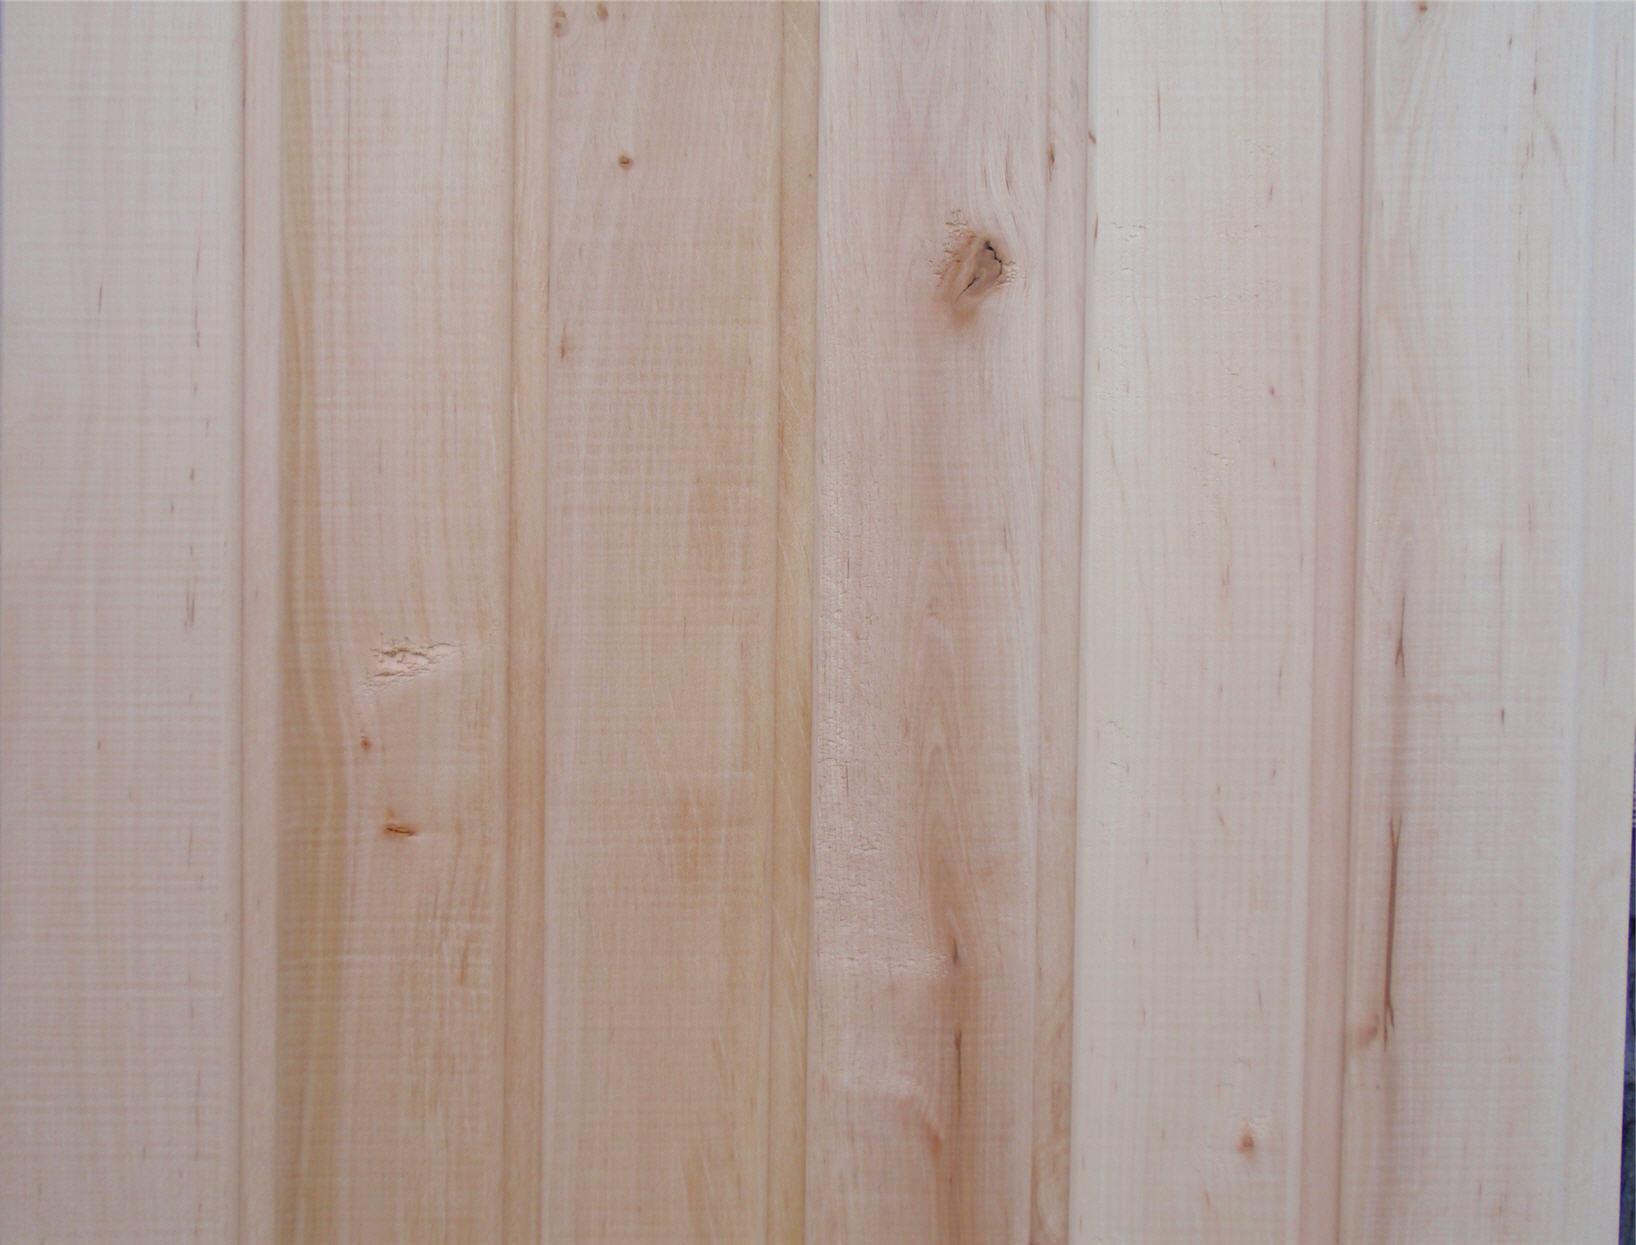 Prix lambris plafond bois prix travaux maison aulnay - Pose lambris mural pvc ...